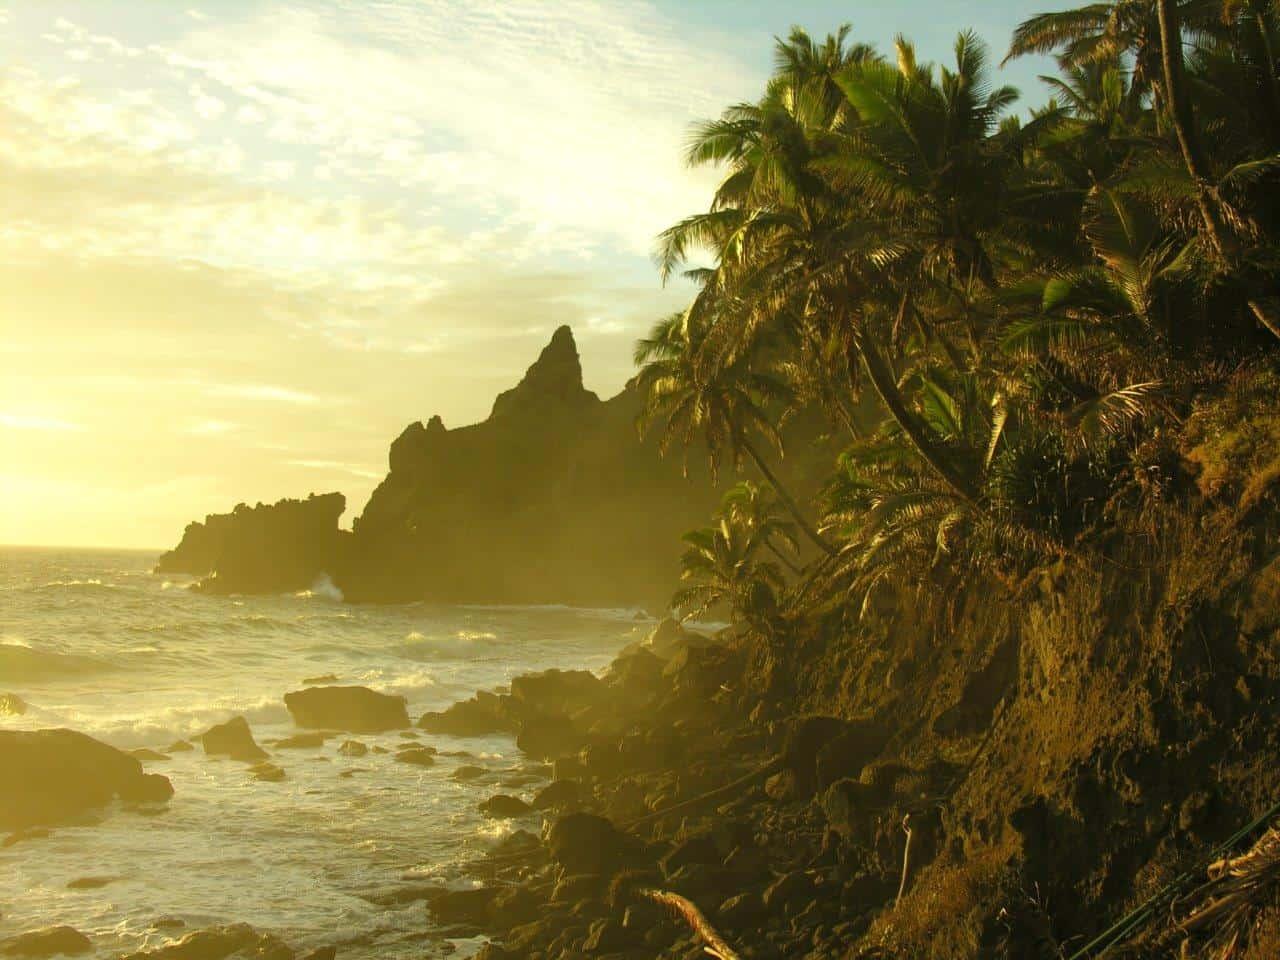 Bounty Bay, Pitcairn Islands